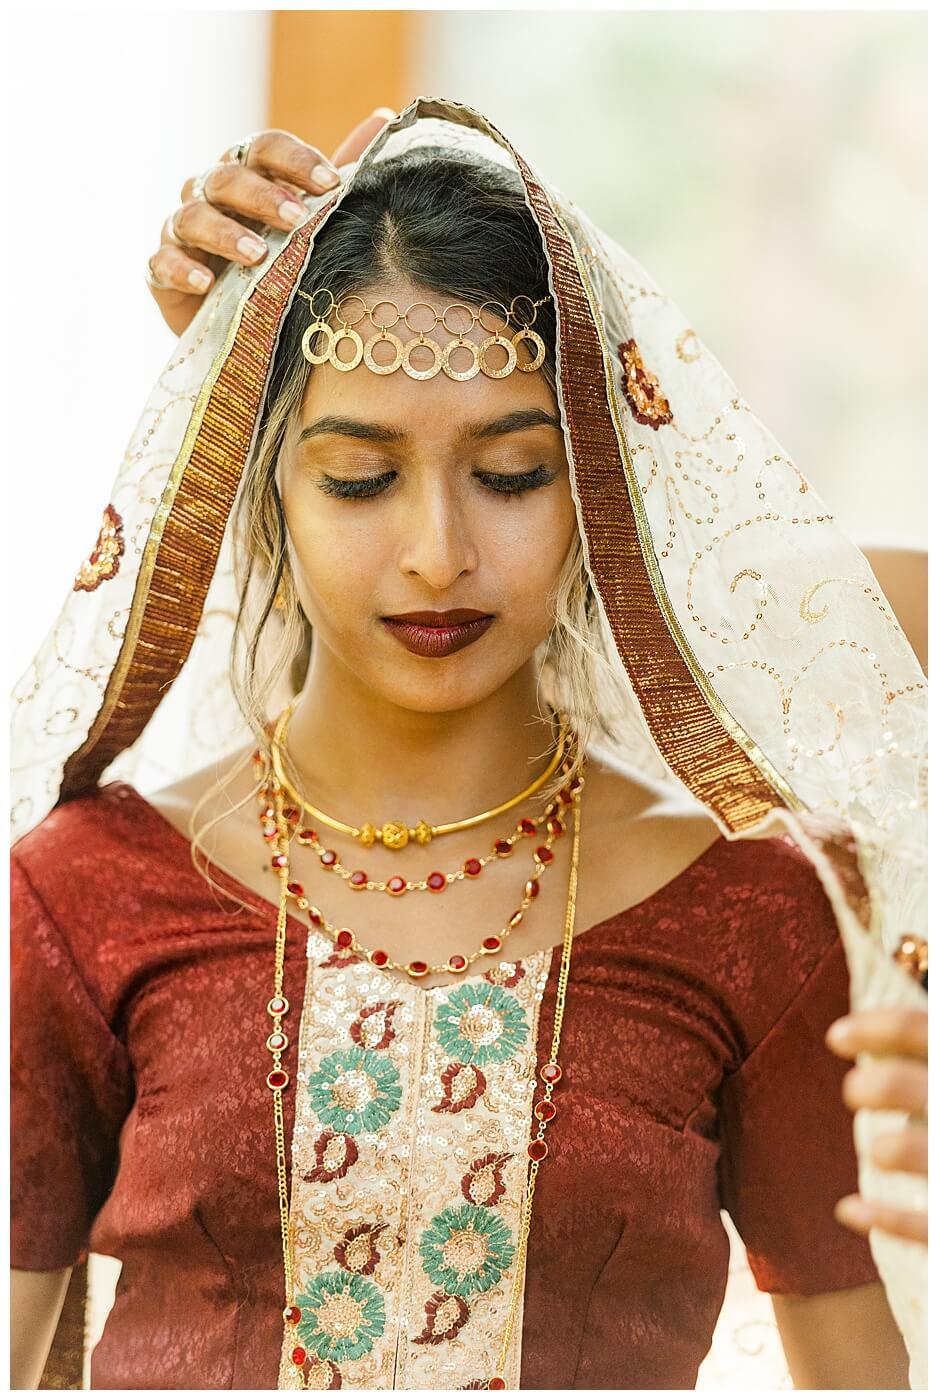 Stephen & Sarah Wedding - 22 - Bride changing into her traditional Lehenga (Sari)